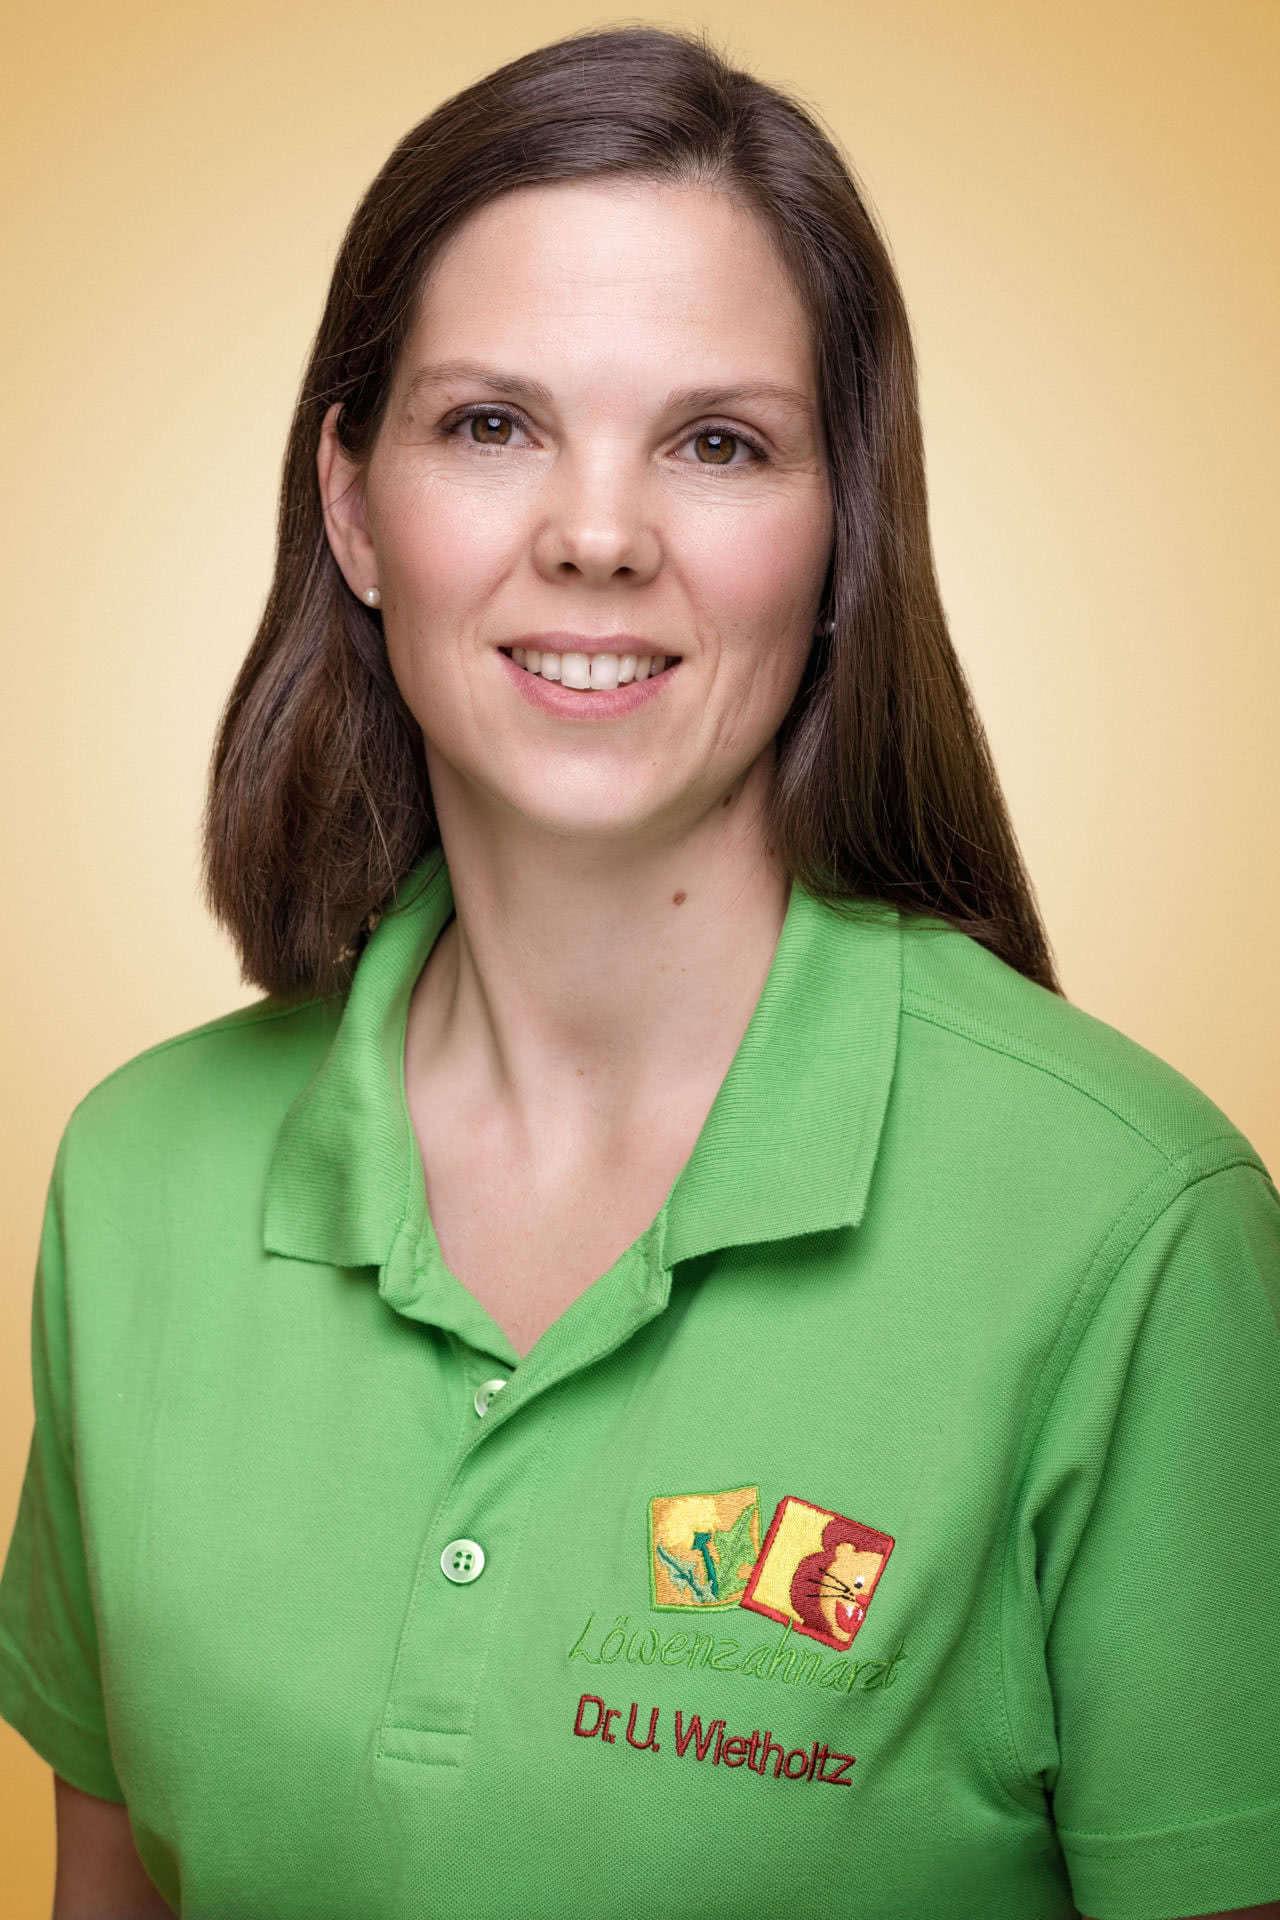 Sorgfältige Kinderzahnärztin Dr. Ulrike Wietholtz